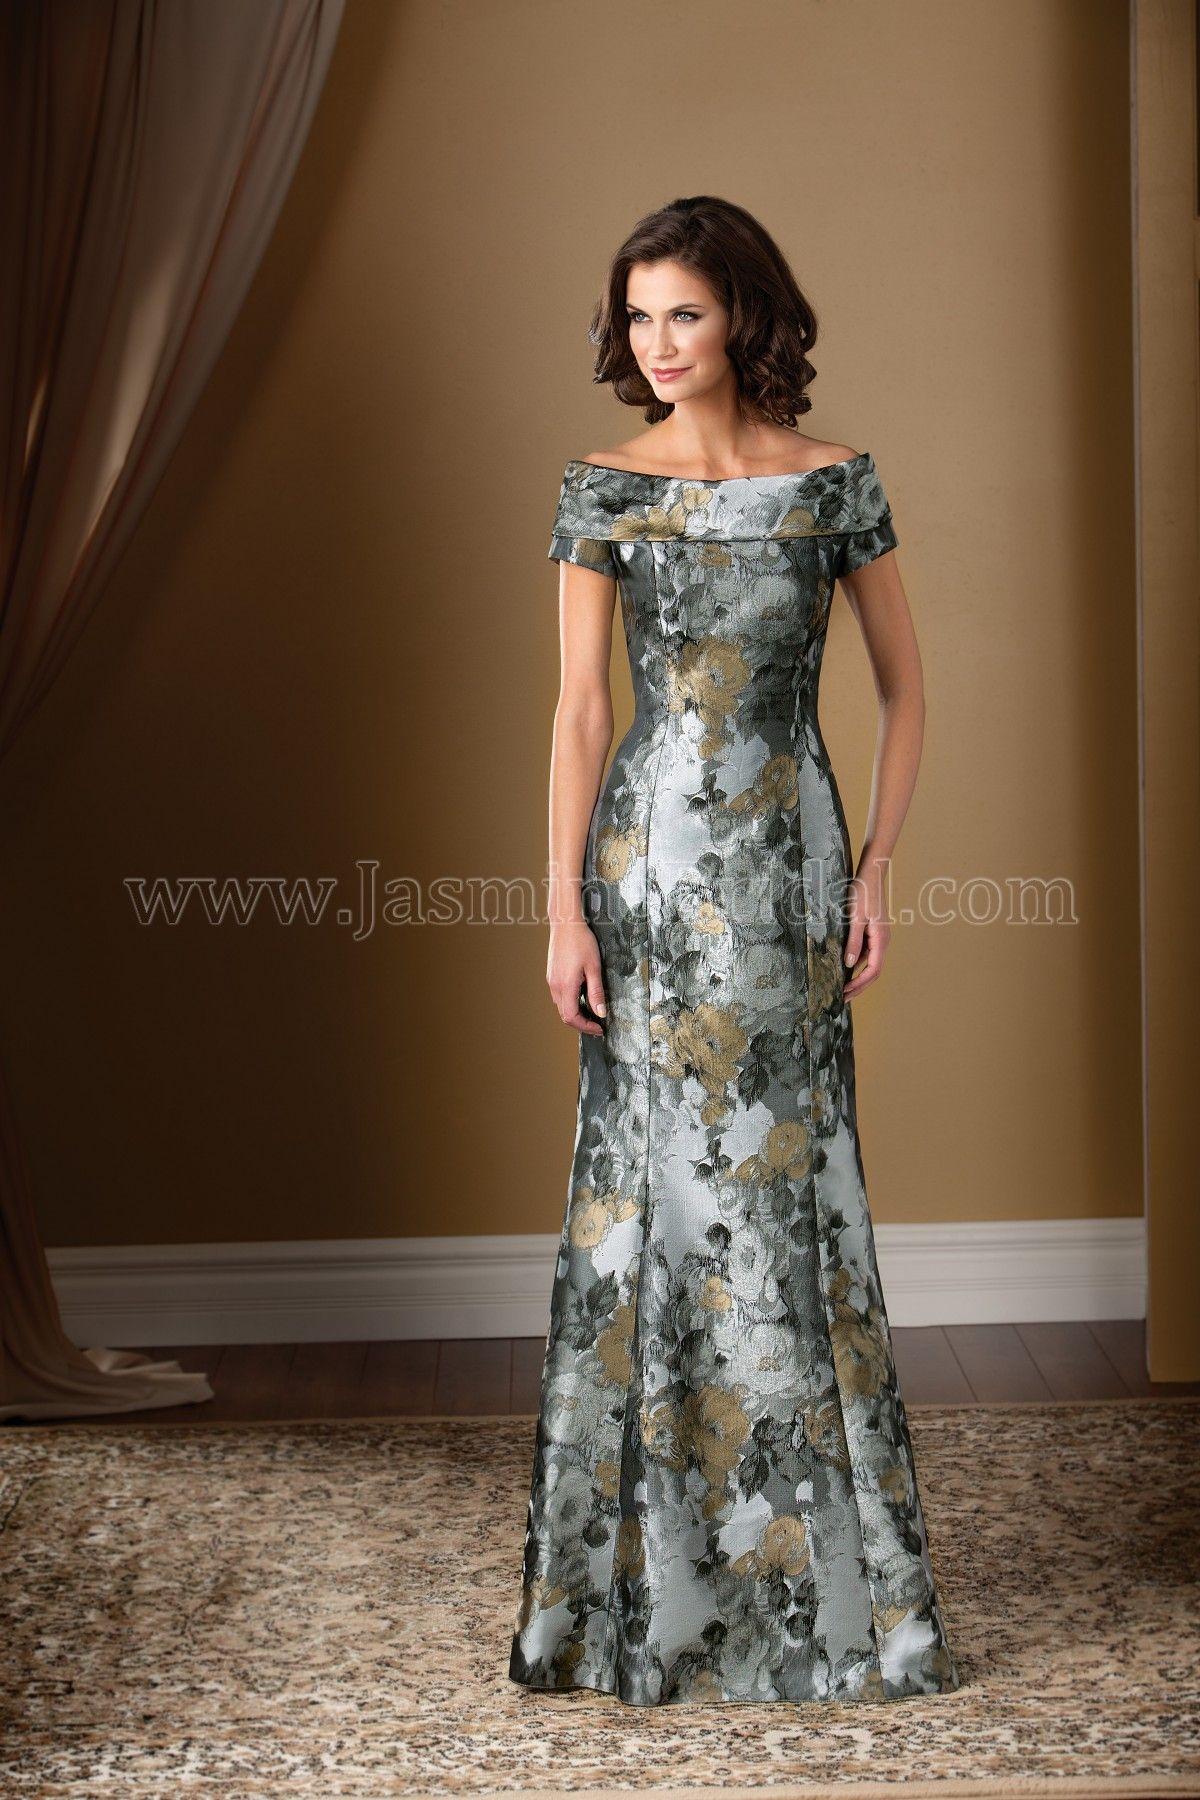 Jasmine bridal mother of the bride groom dress jade for Fall wedding mother of the groom dresses